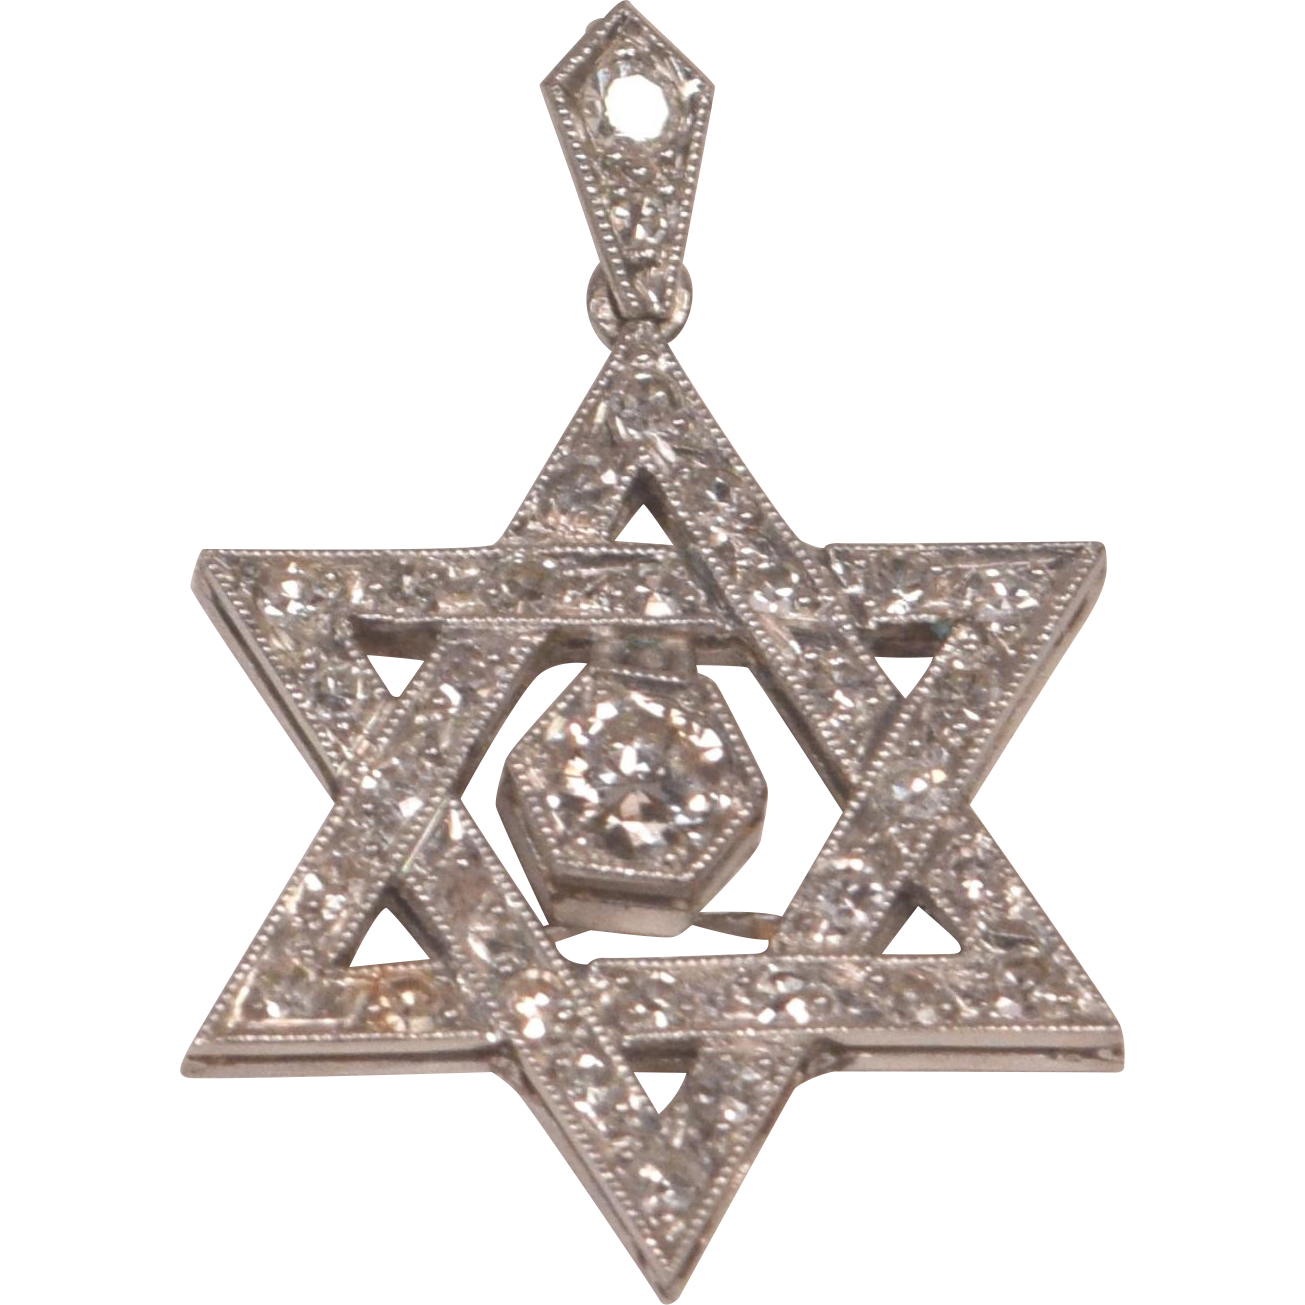 Vintage Platinum And Diamonds Star Of David Pendant From